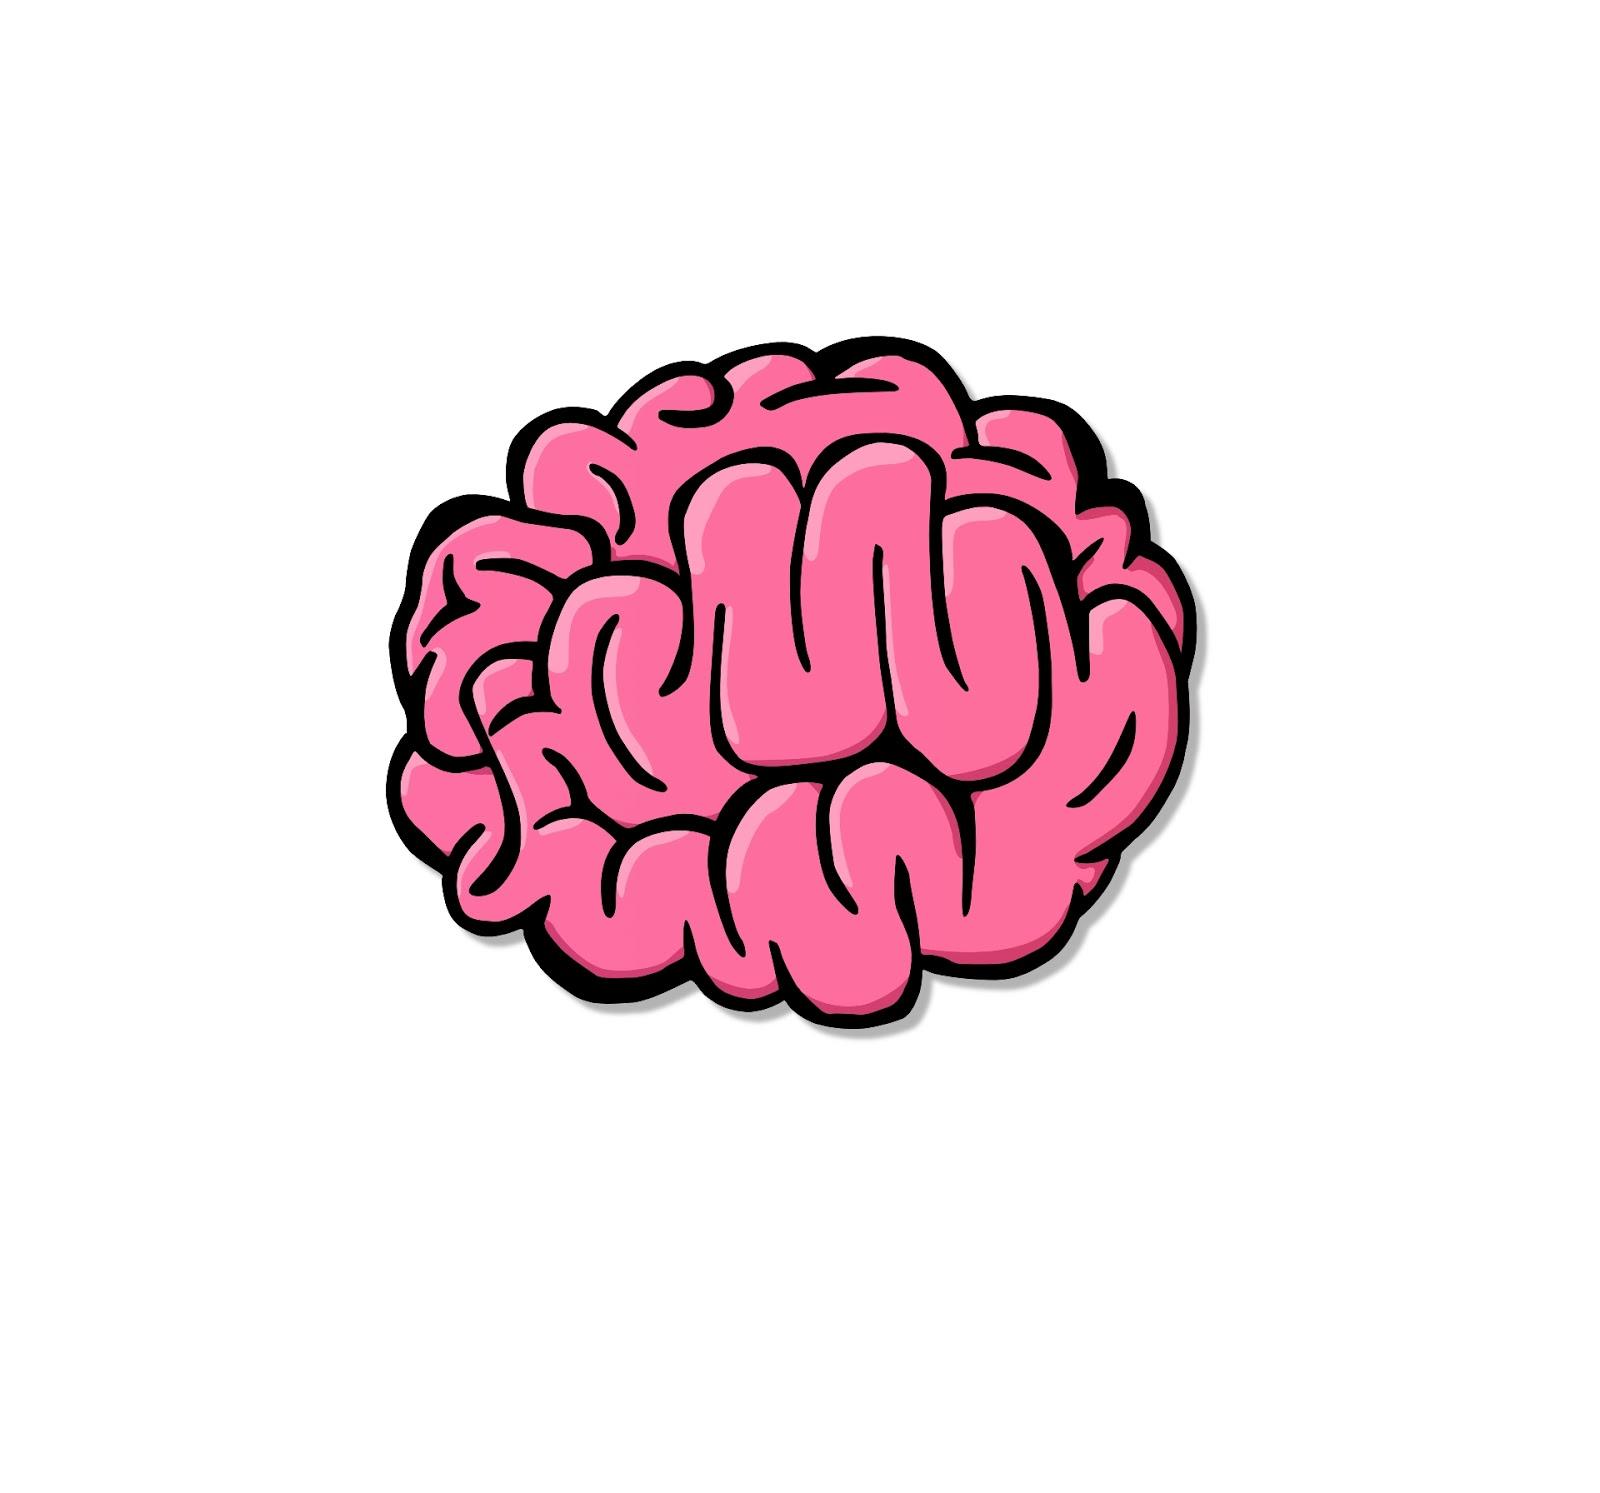 animated brain clipart - photo #2